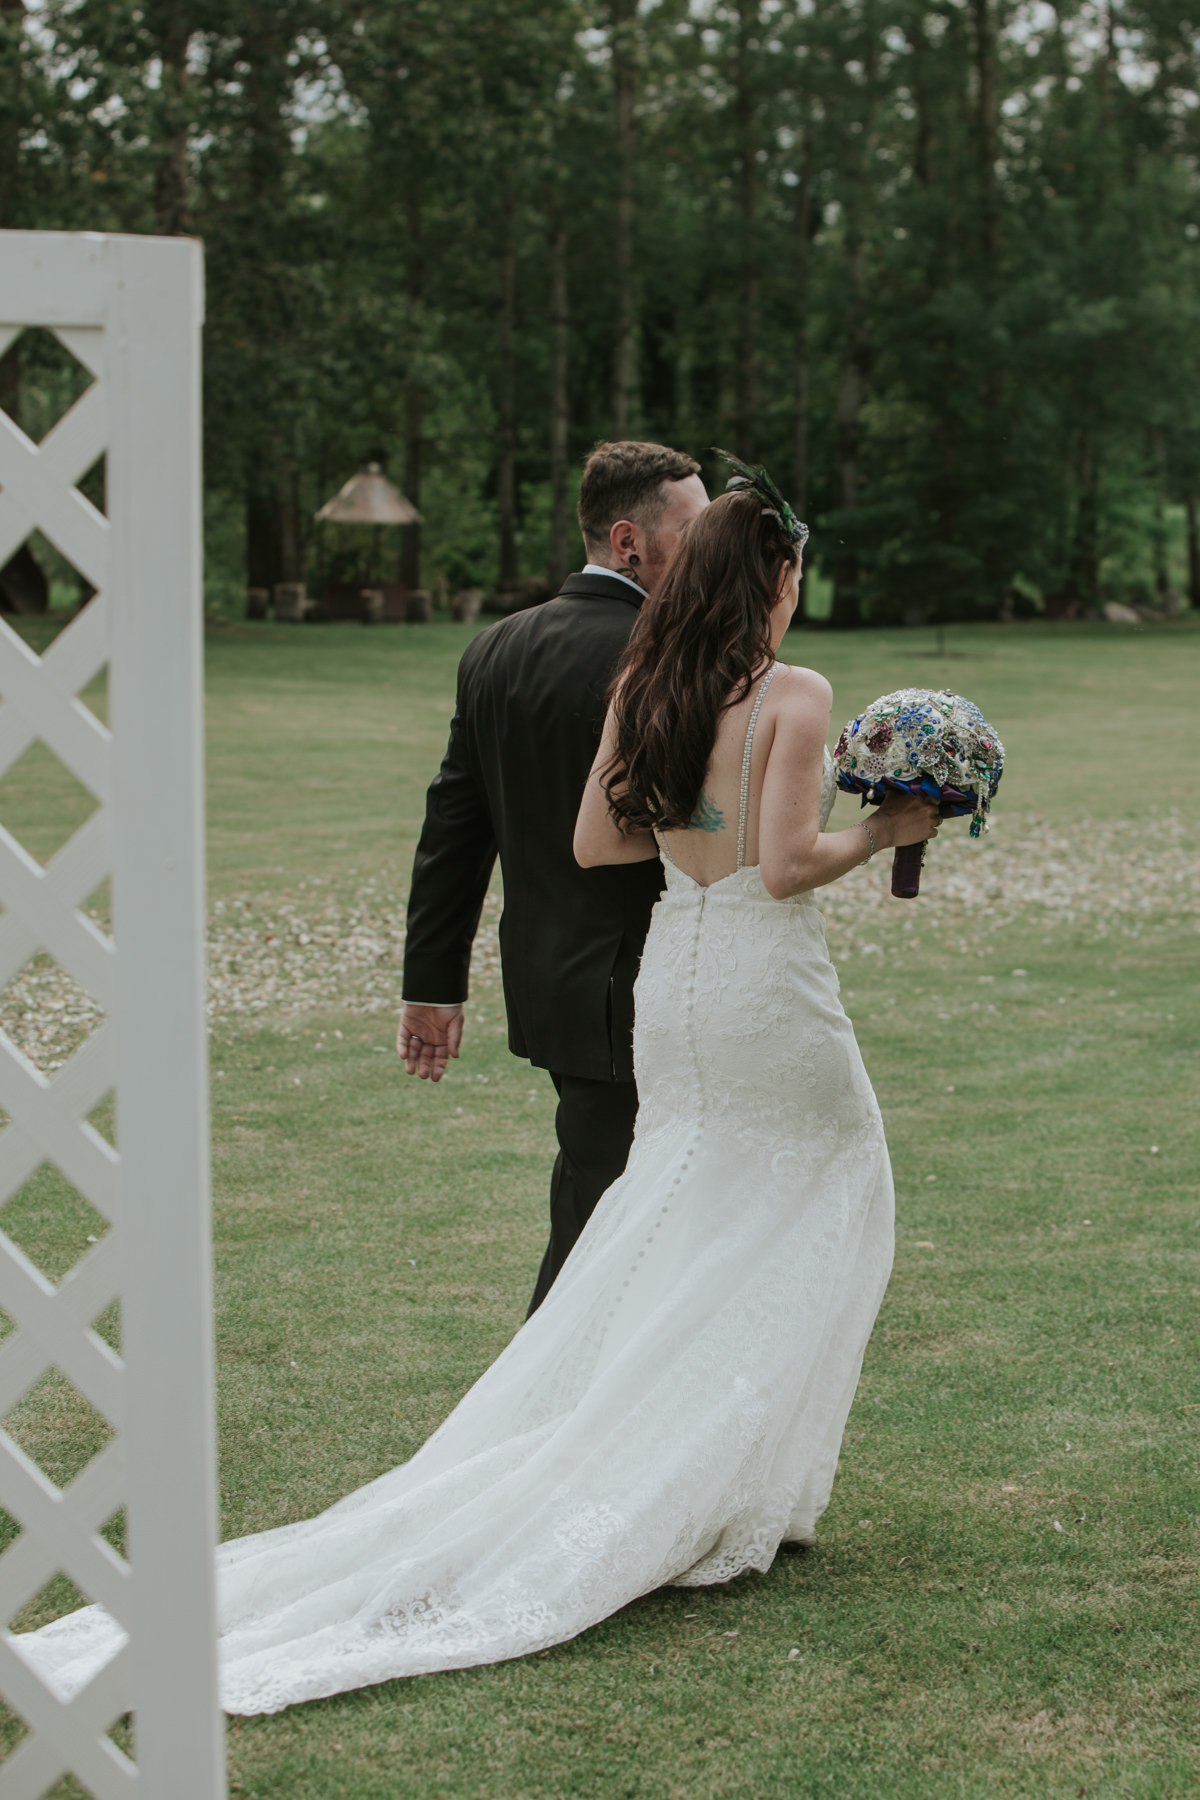 Vancouver Wedding Photographer Pam (37).jpg